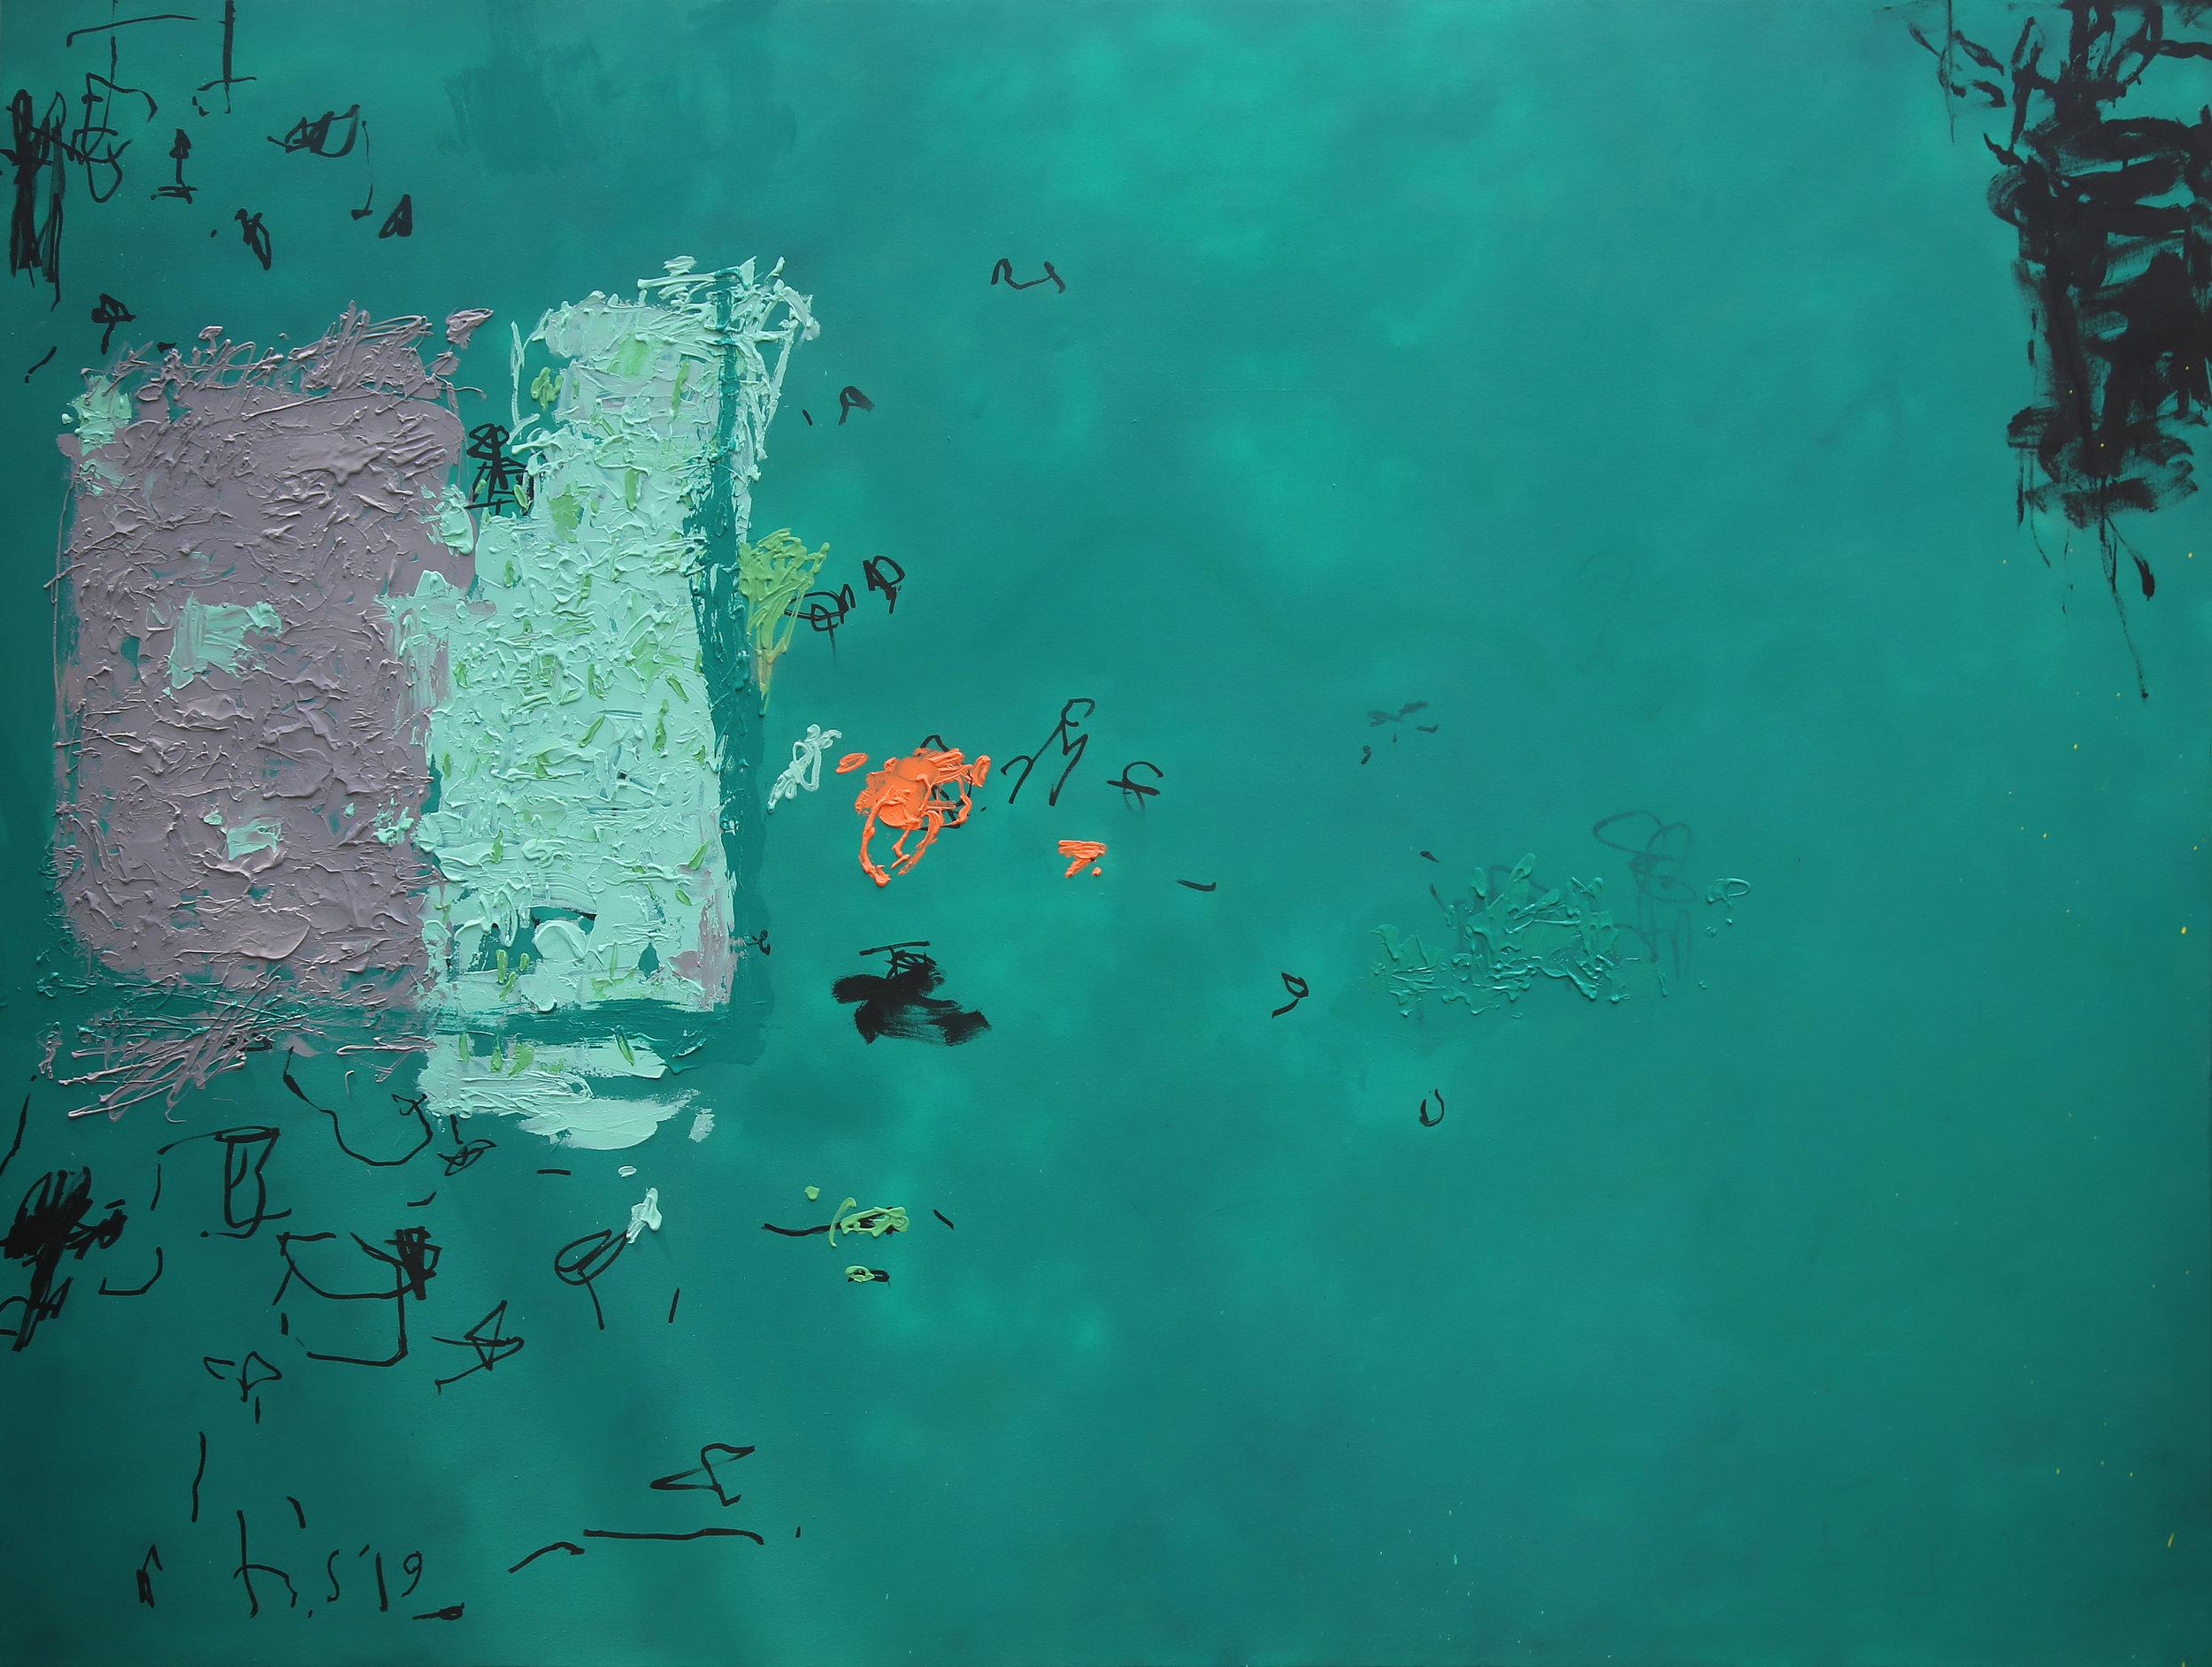 Artist: HEDI SOETARDJA, INDONESIA  Title: Serpihan Ingatan Di Atas Hamparan Hijau Medium: acrylic, spray paint, rubber pasta and marker on canvas  Dimension: 180 X 240 cm  Year: 2019